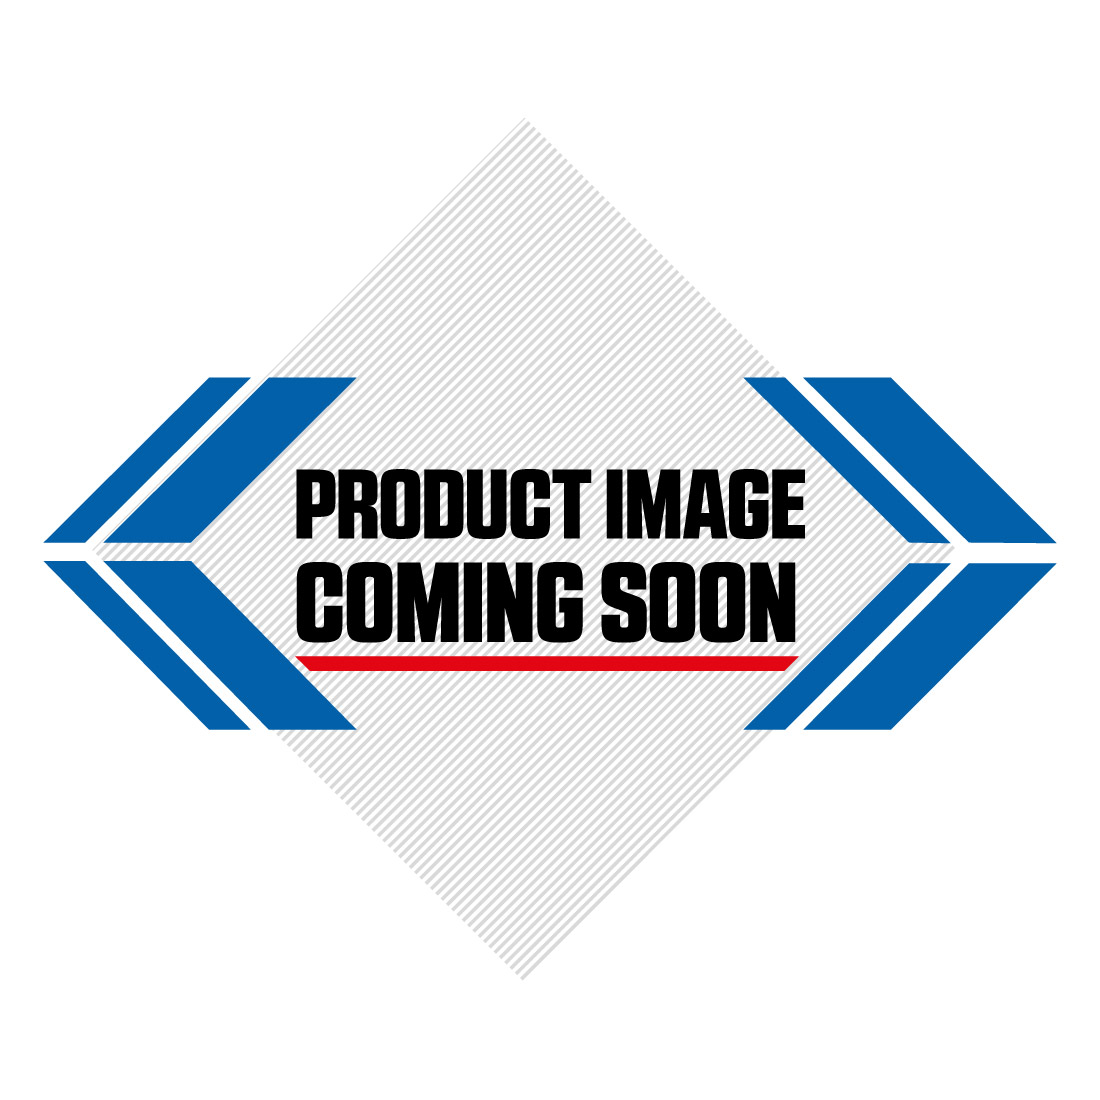 Suzuki Restyled Plastic Kit  RM 85 (00-20) RM Yellow 01-on Image-2>